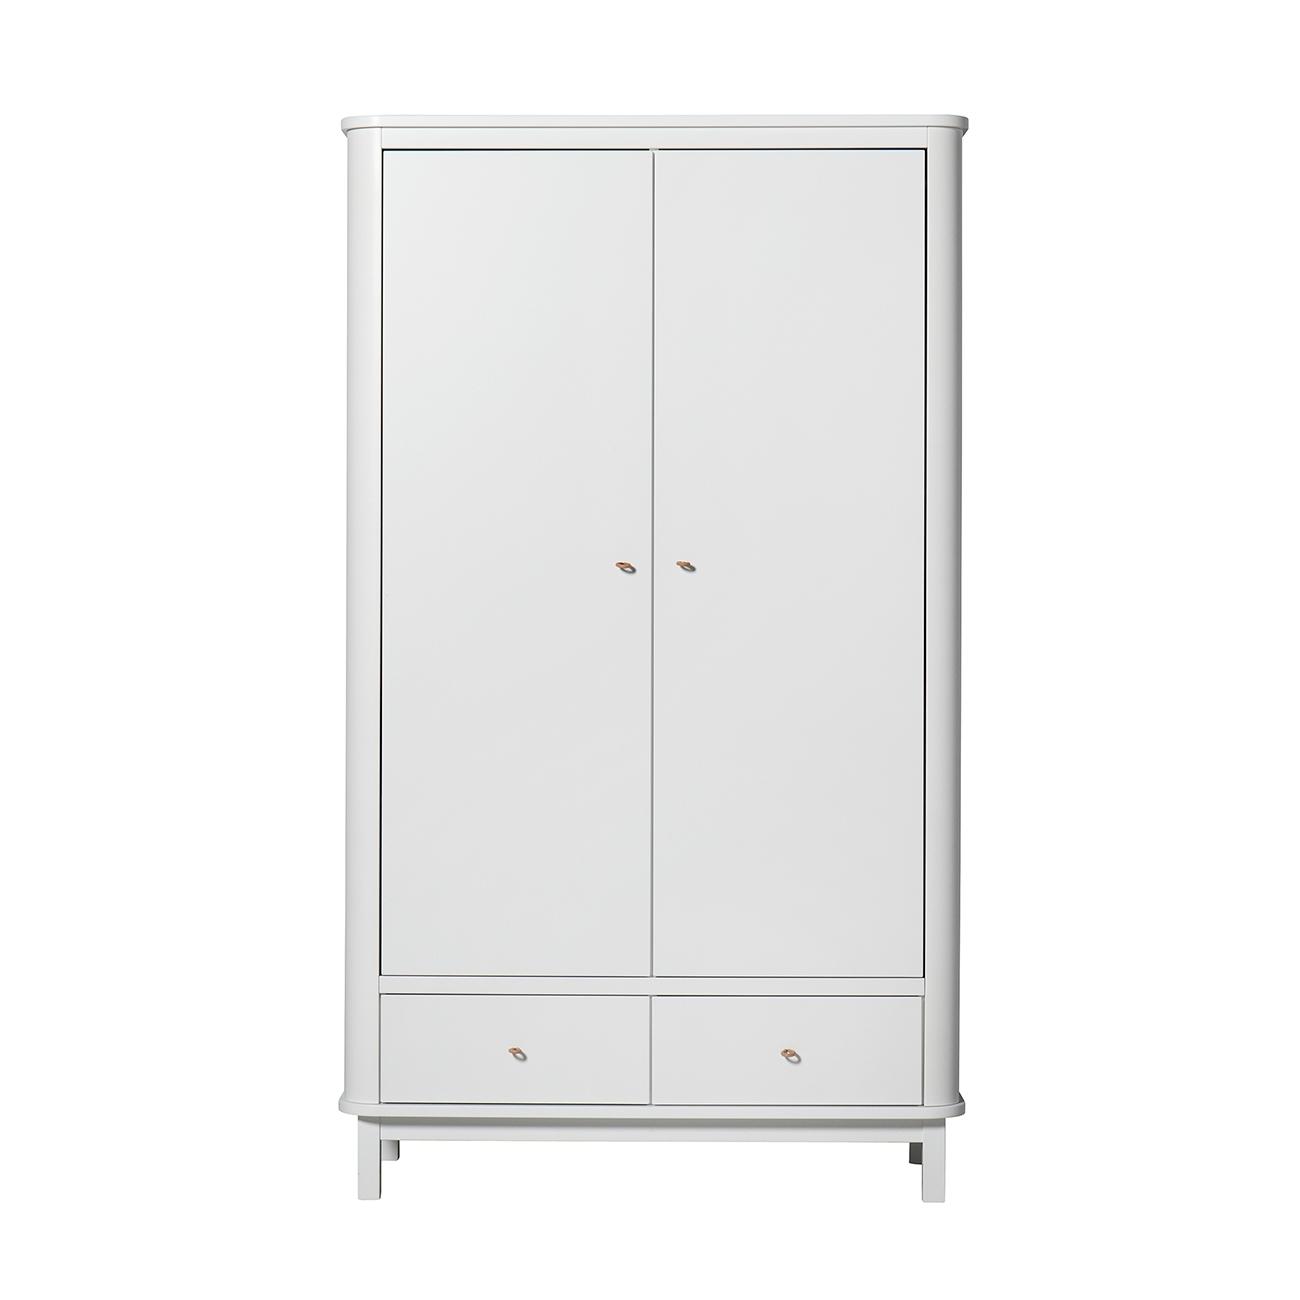 Garderob 2 dörrar Wood vit/ vit, Oliver Furniture